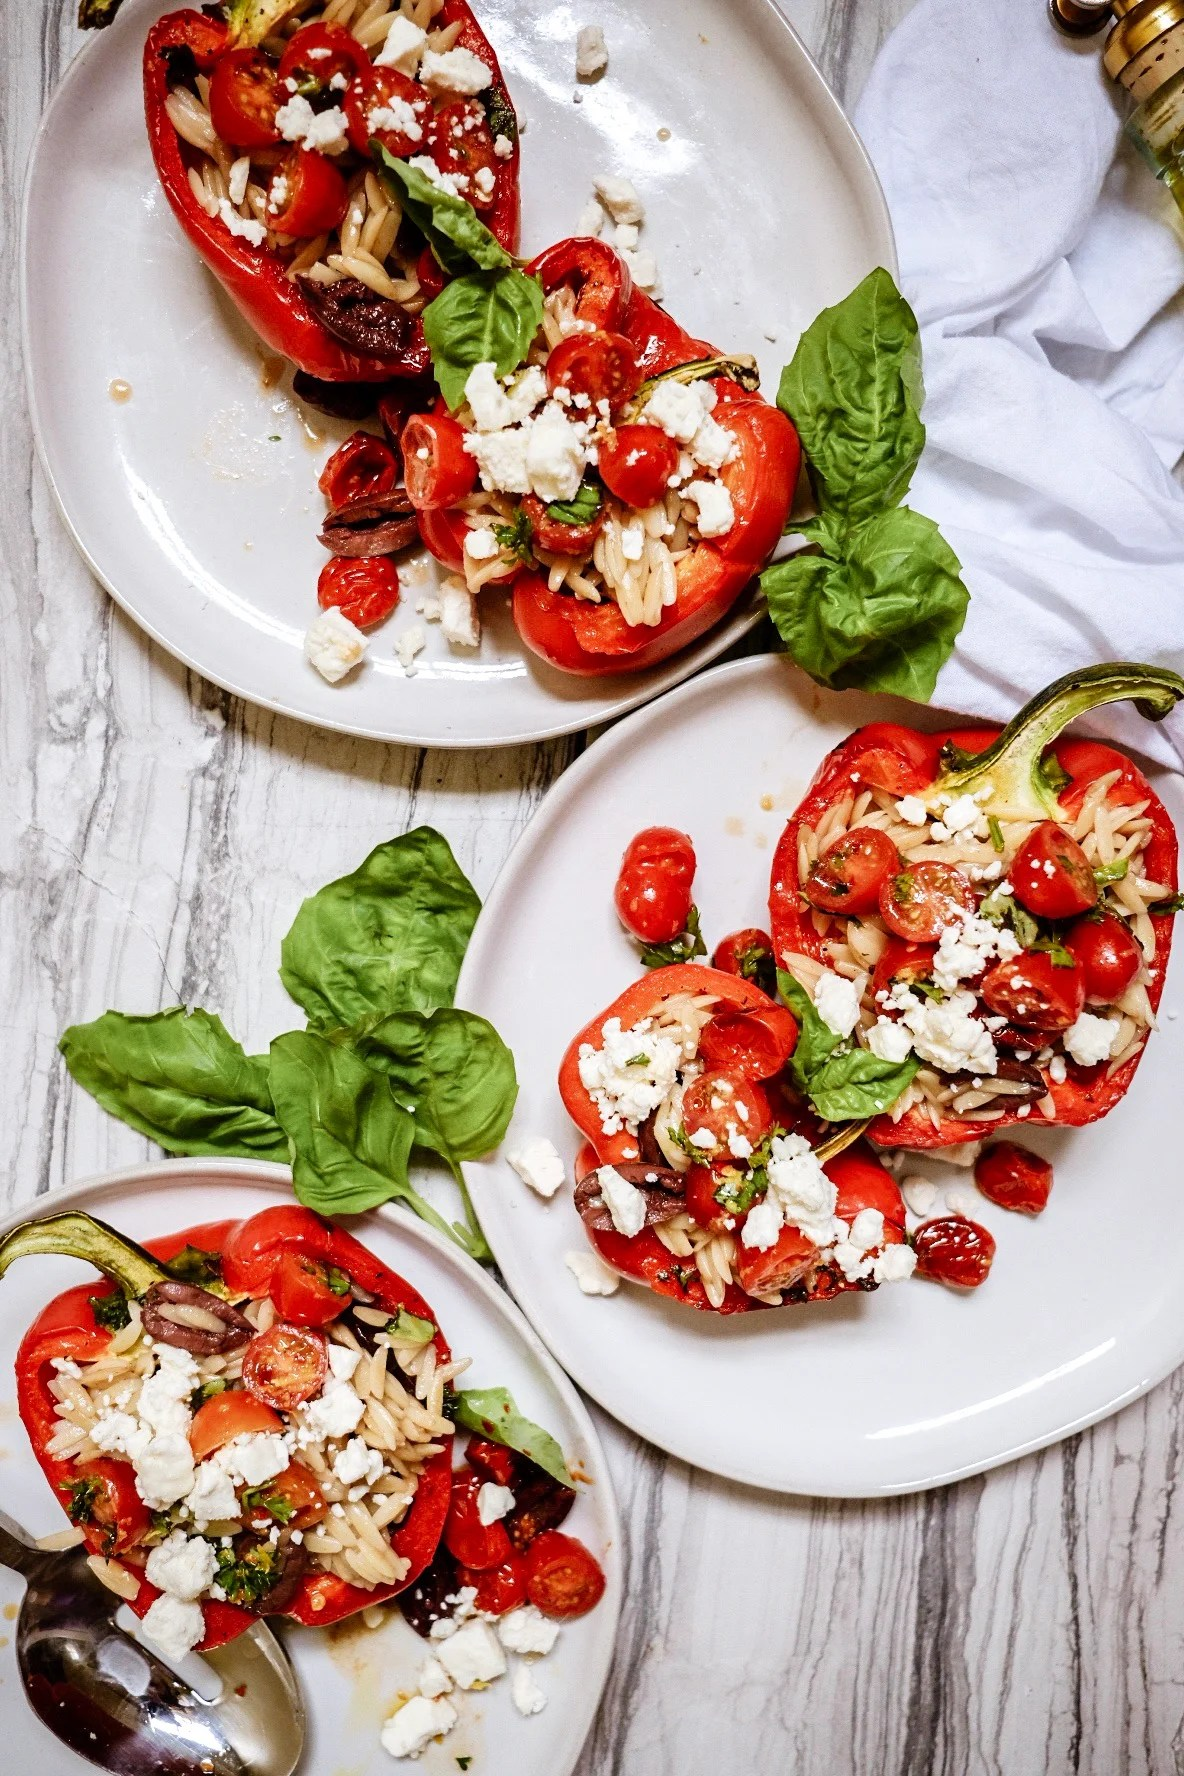 Mediterranean Roasted Red Stuffed Peppers